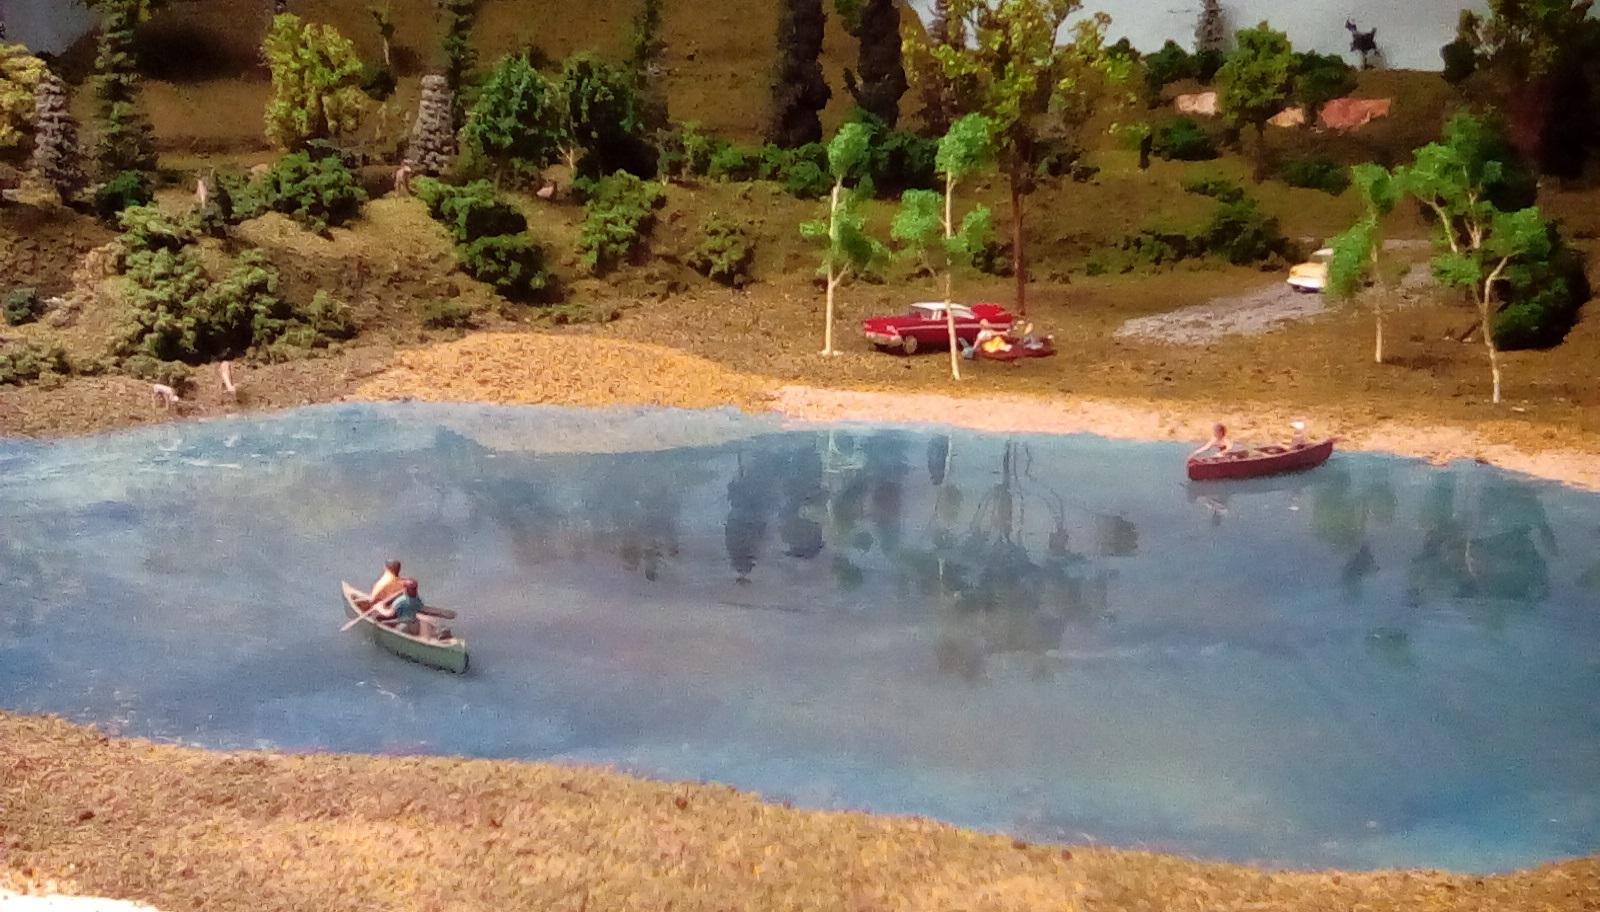 LakeLayout1.jpg